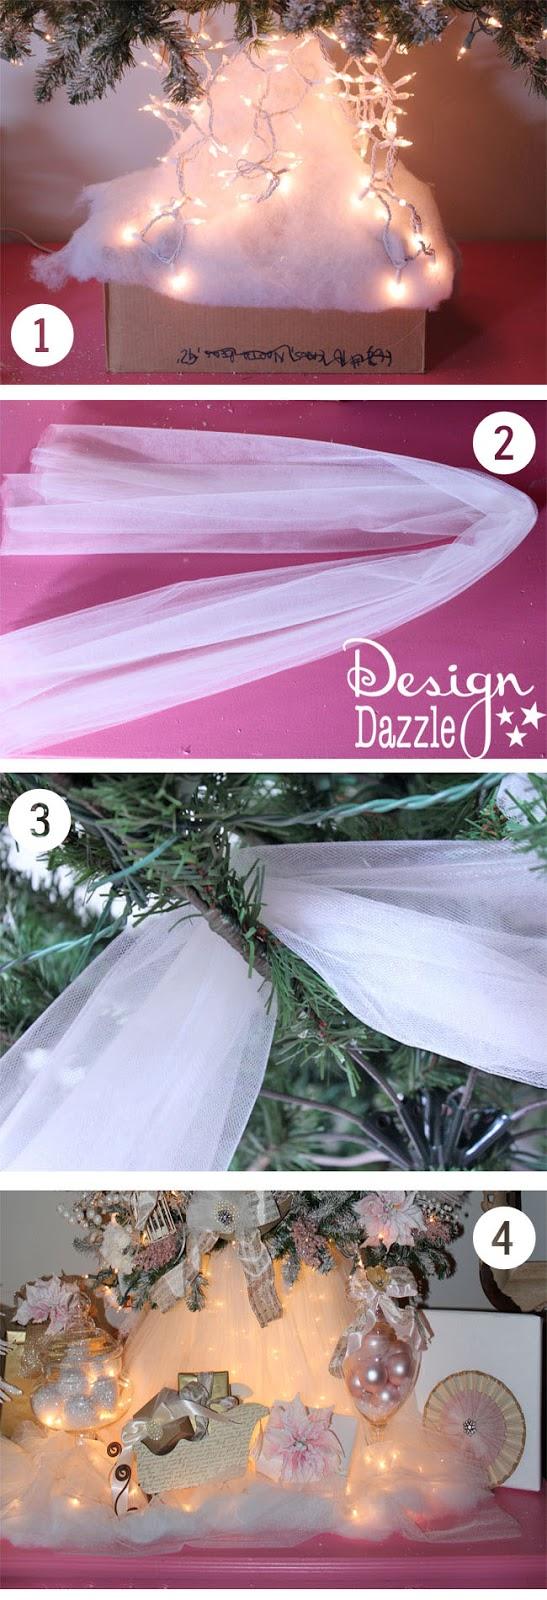 No sew Christmas tree skirt - Design Dazzle